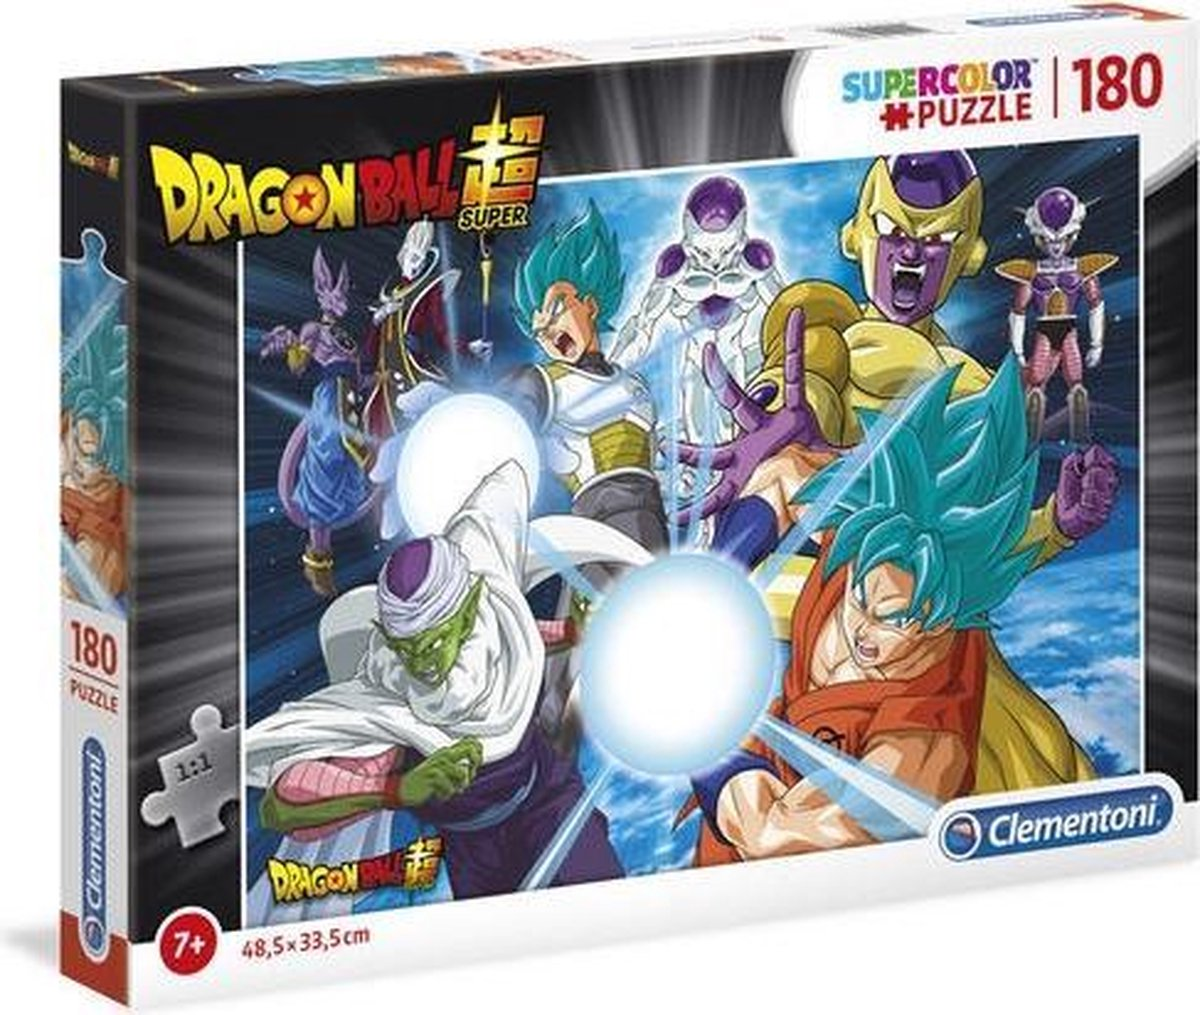 Clementoni Legpuzzel Dragon Ball Super 180 Stukjes